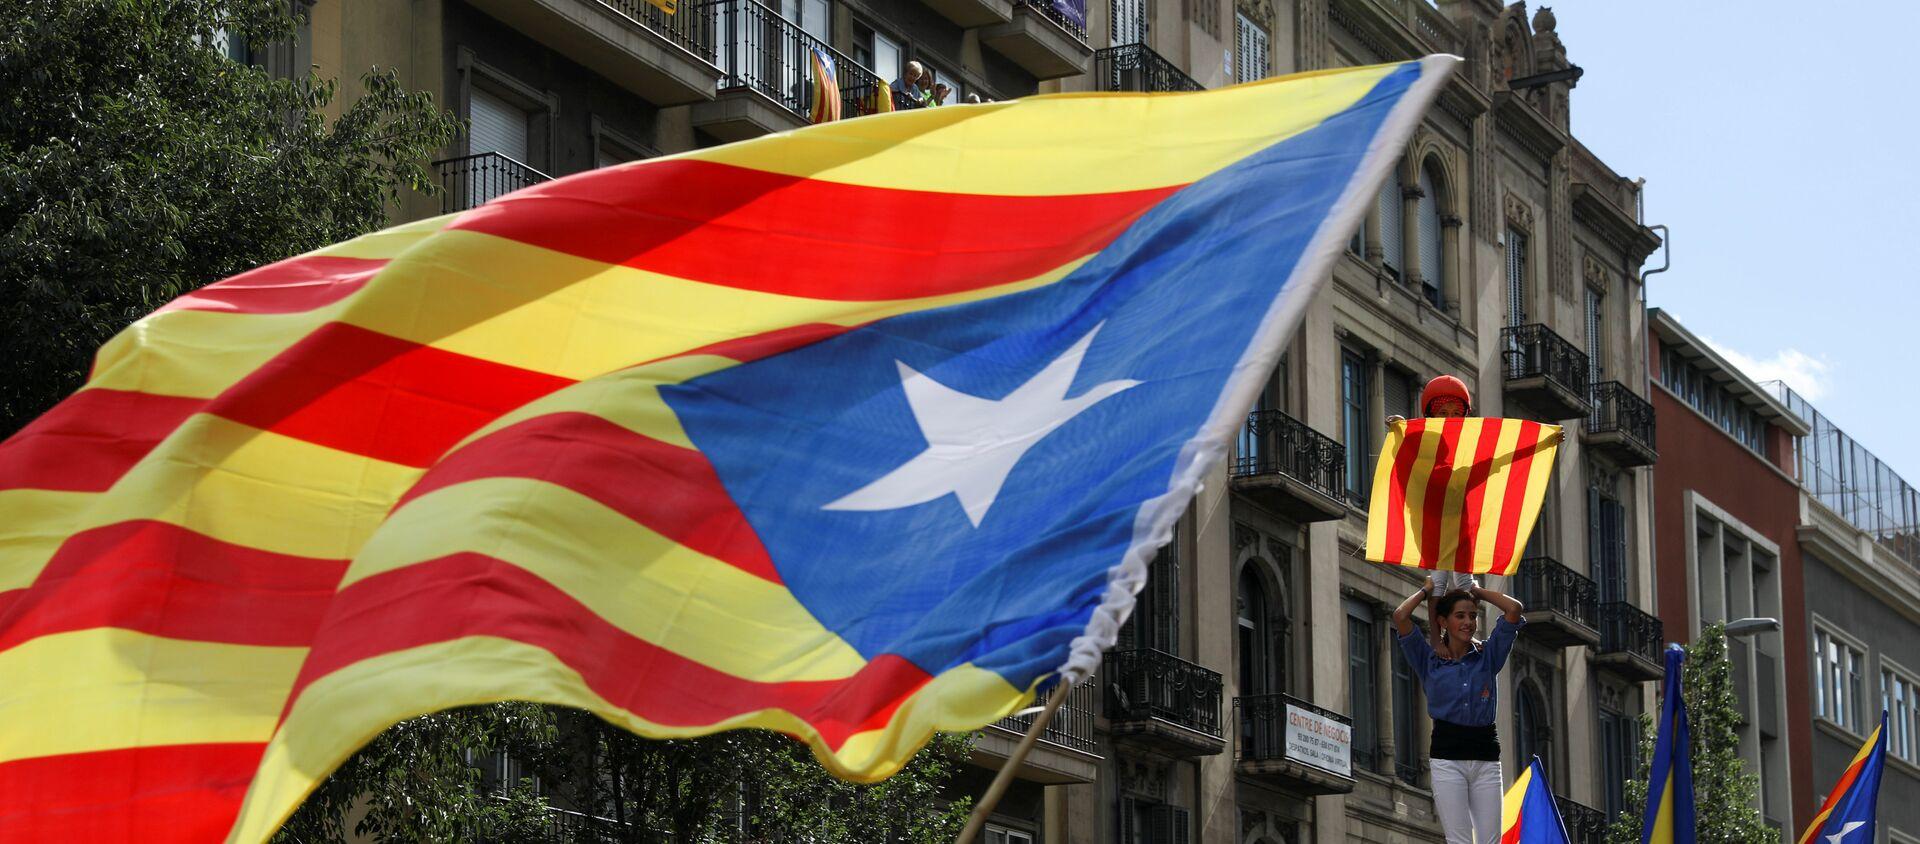 Estelada, bandera independentista de Cataluña - Sputnik Mundo, 1920, 21.11.2019